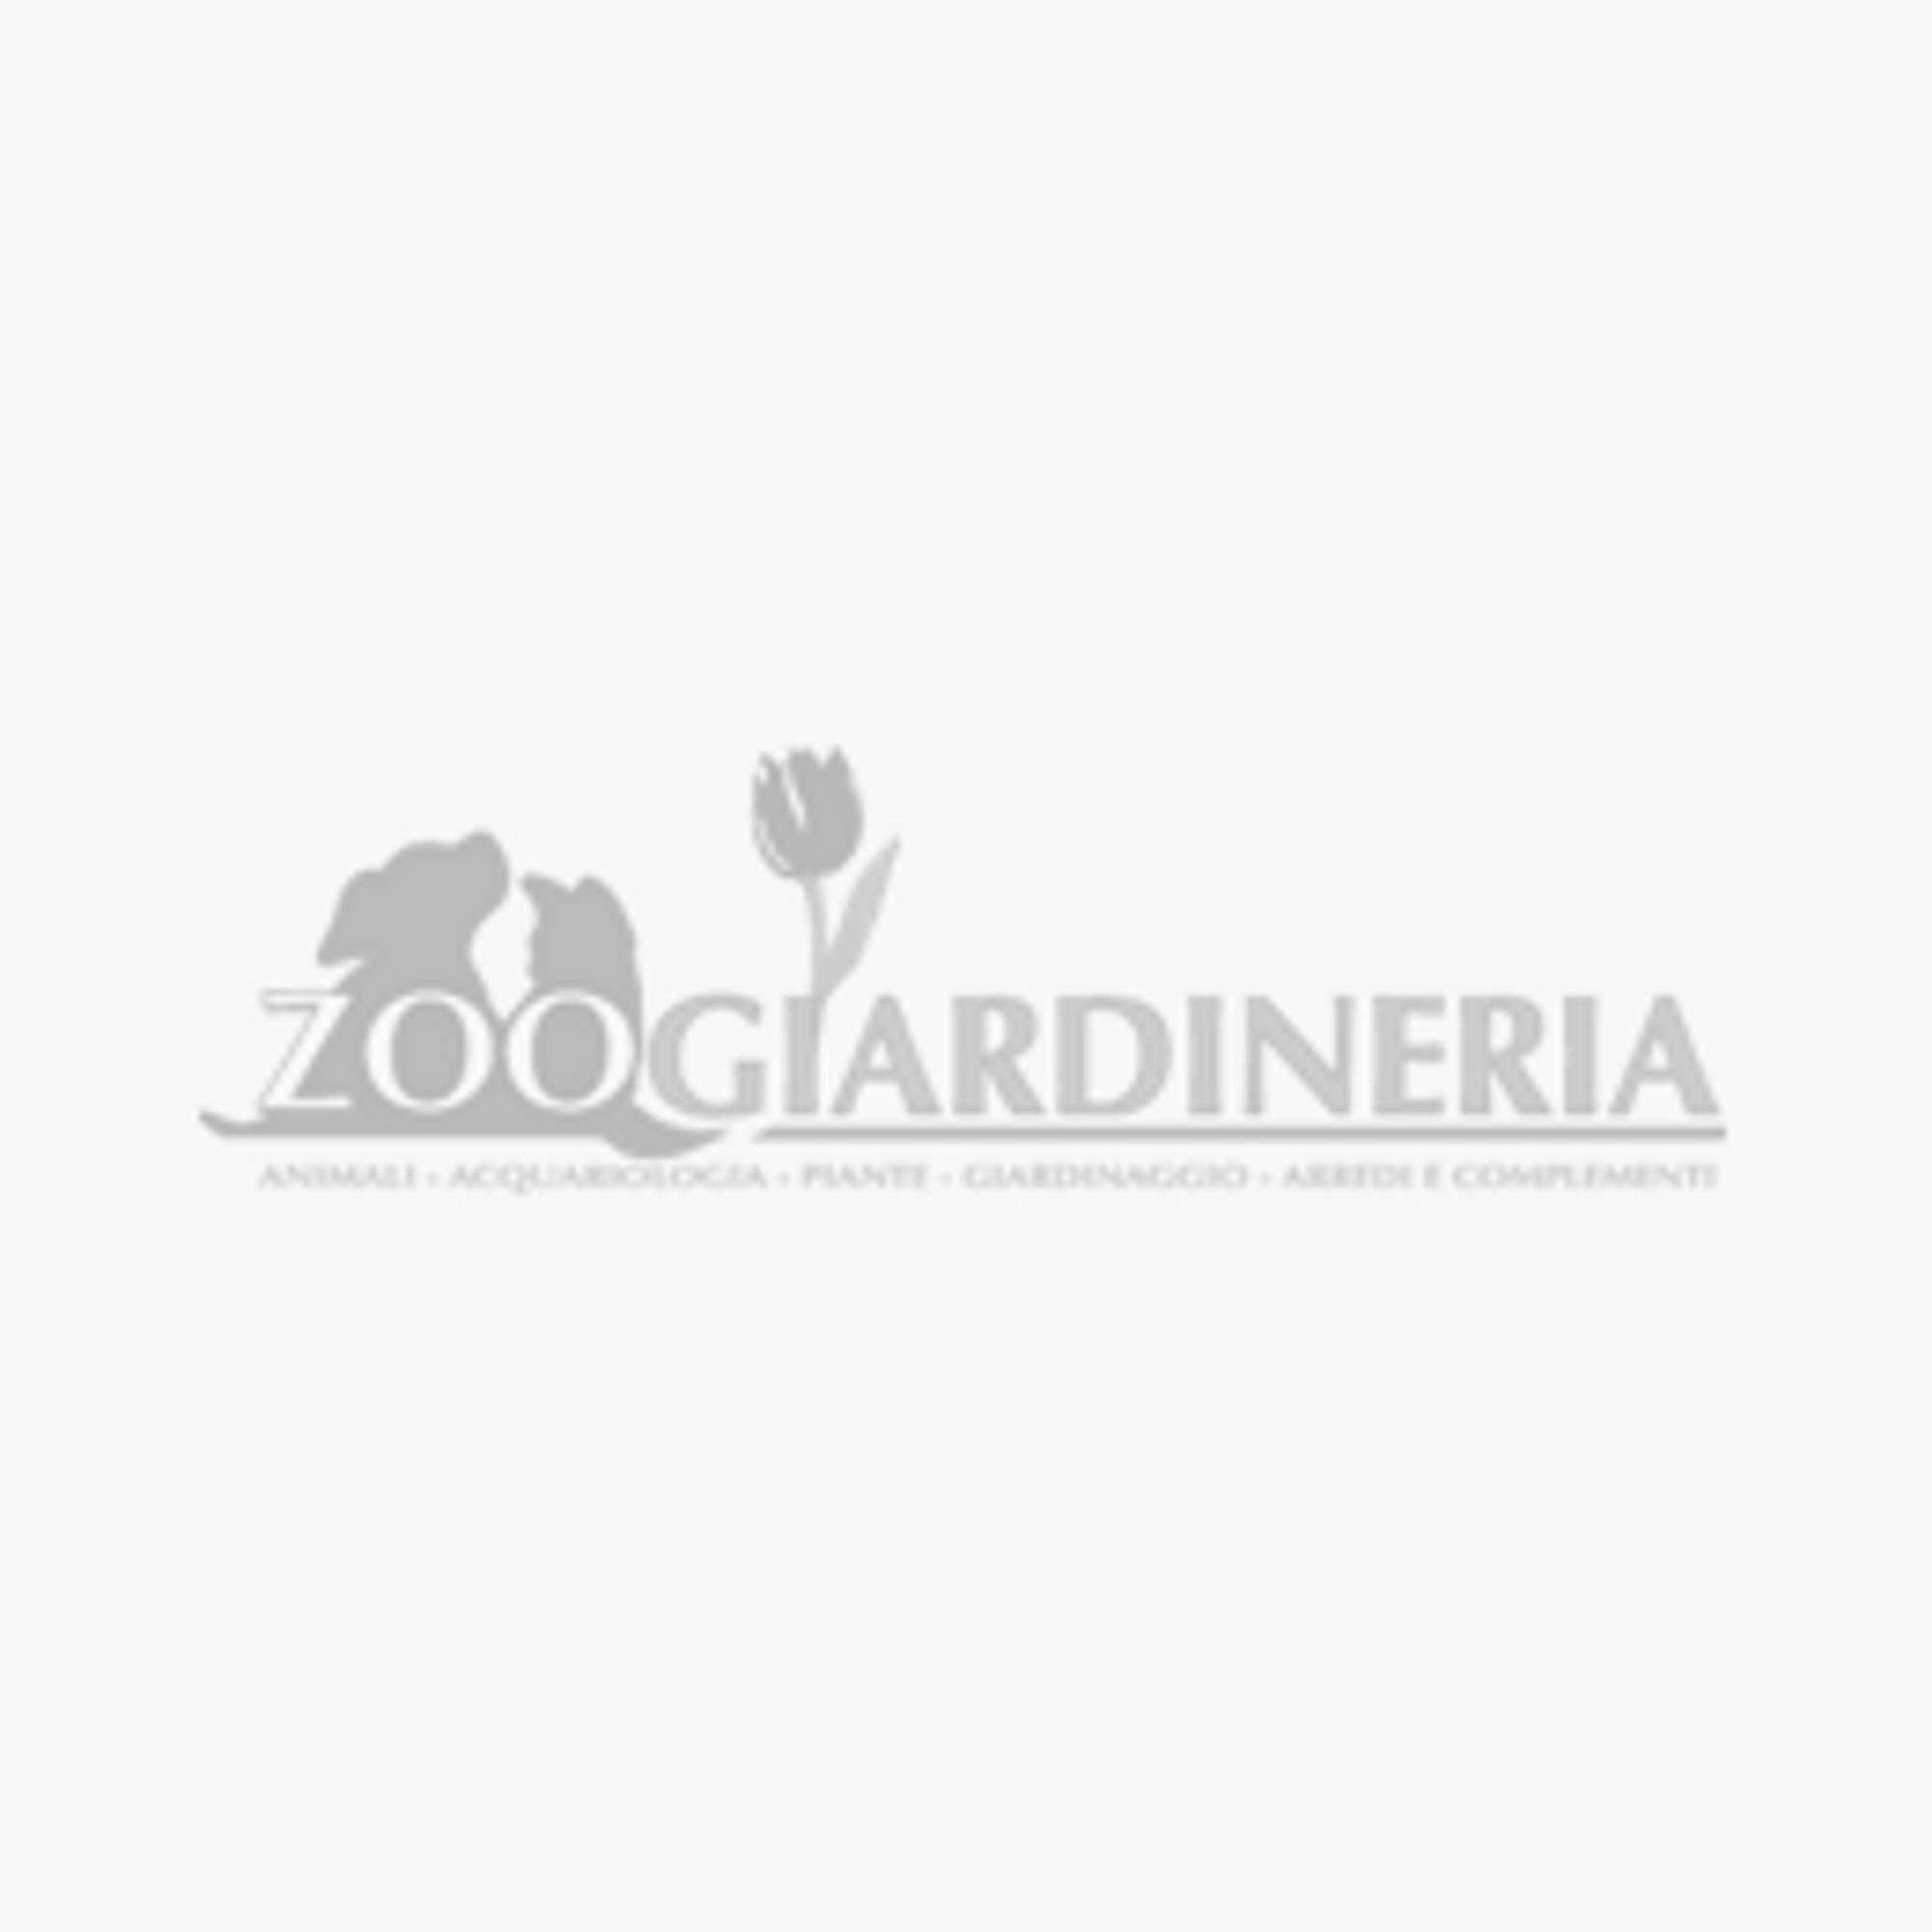 Lotti Catena 20 MicroLED BIANCO 1,5mm Luce Fissa a Batteria Interno Cavo Metal Argento 0,1+1,9m